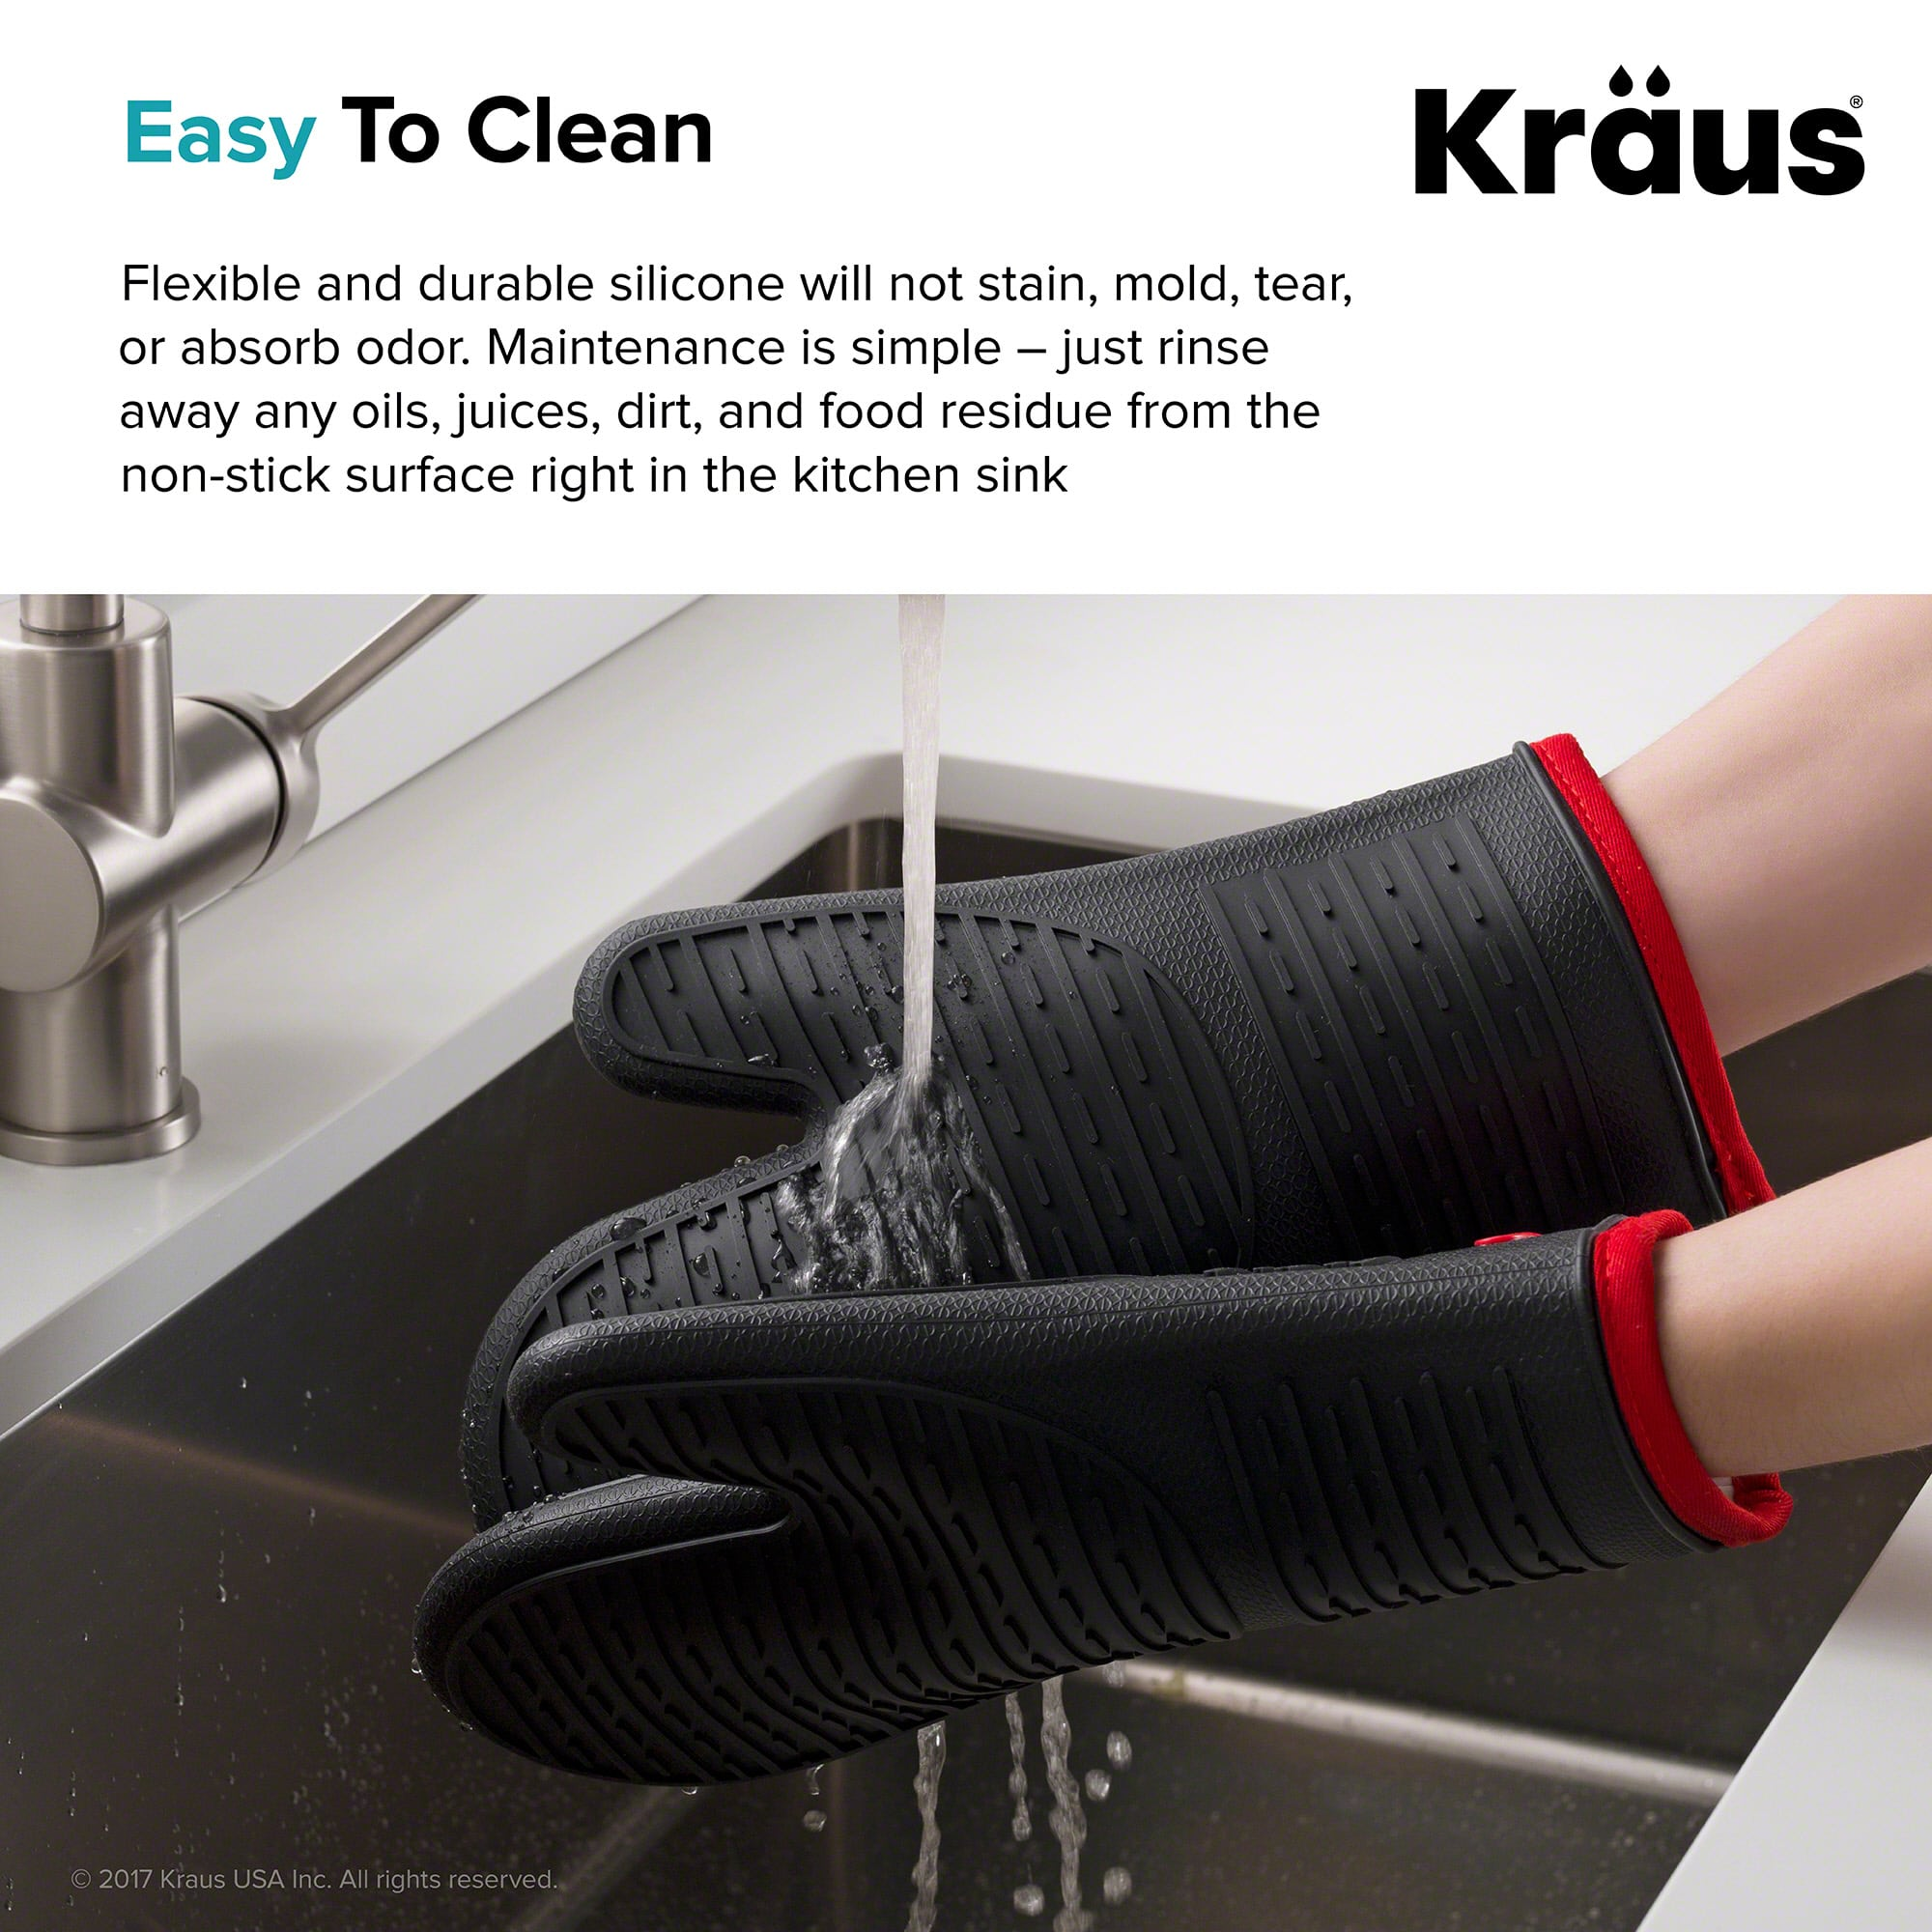 Kraus KSM-1B-KSM-1B Black Silicone Kitchen Mitt Set - Faucet.com